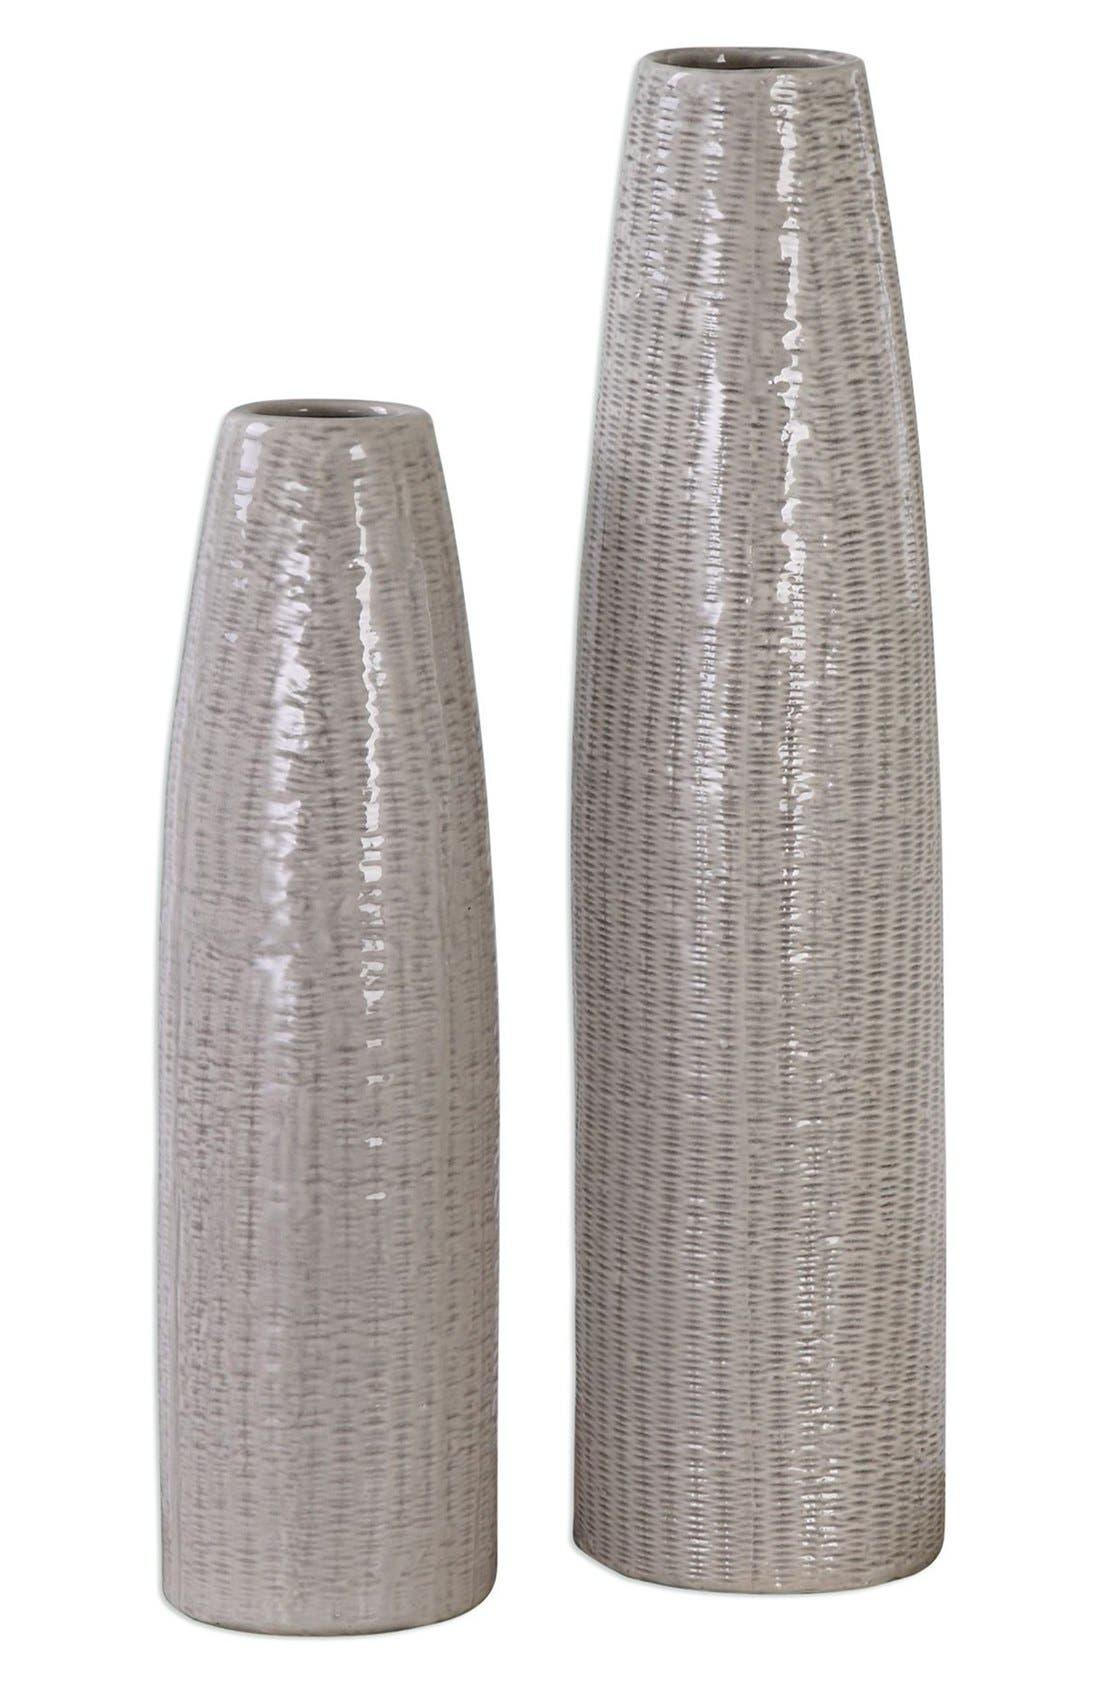 Alternate Image 1 Selected - Uttermost Textured Ceramic Vases (Set of 2)